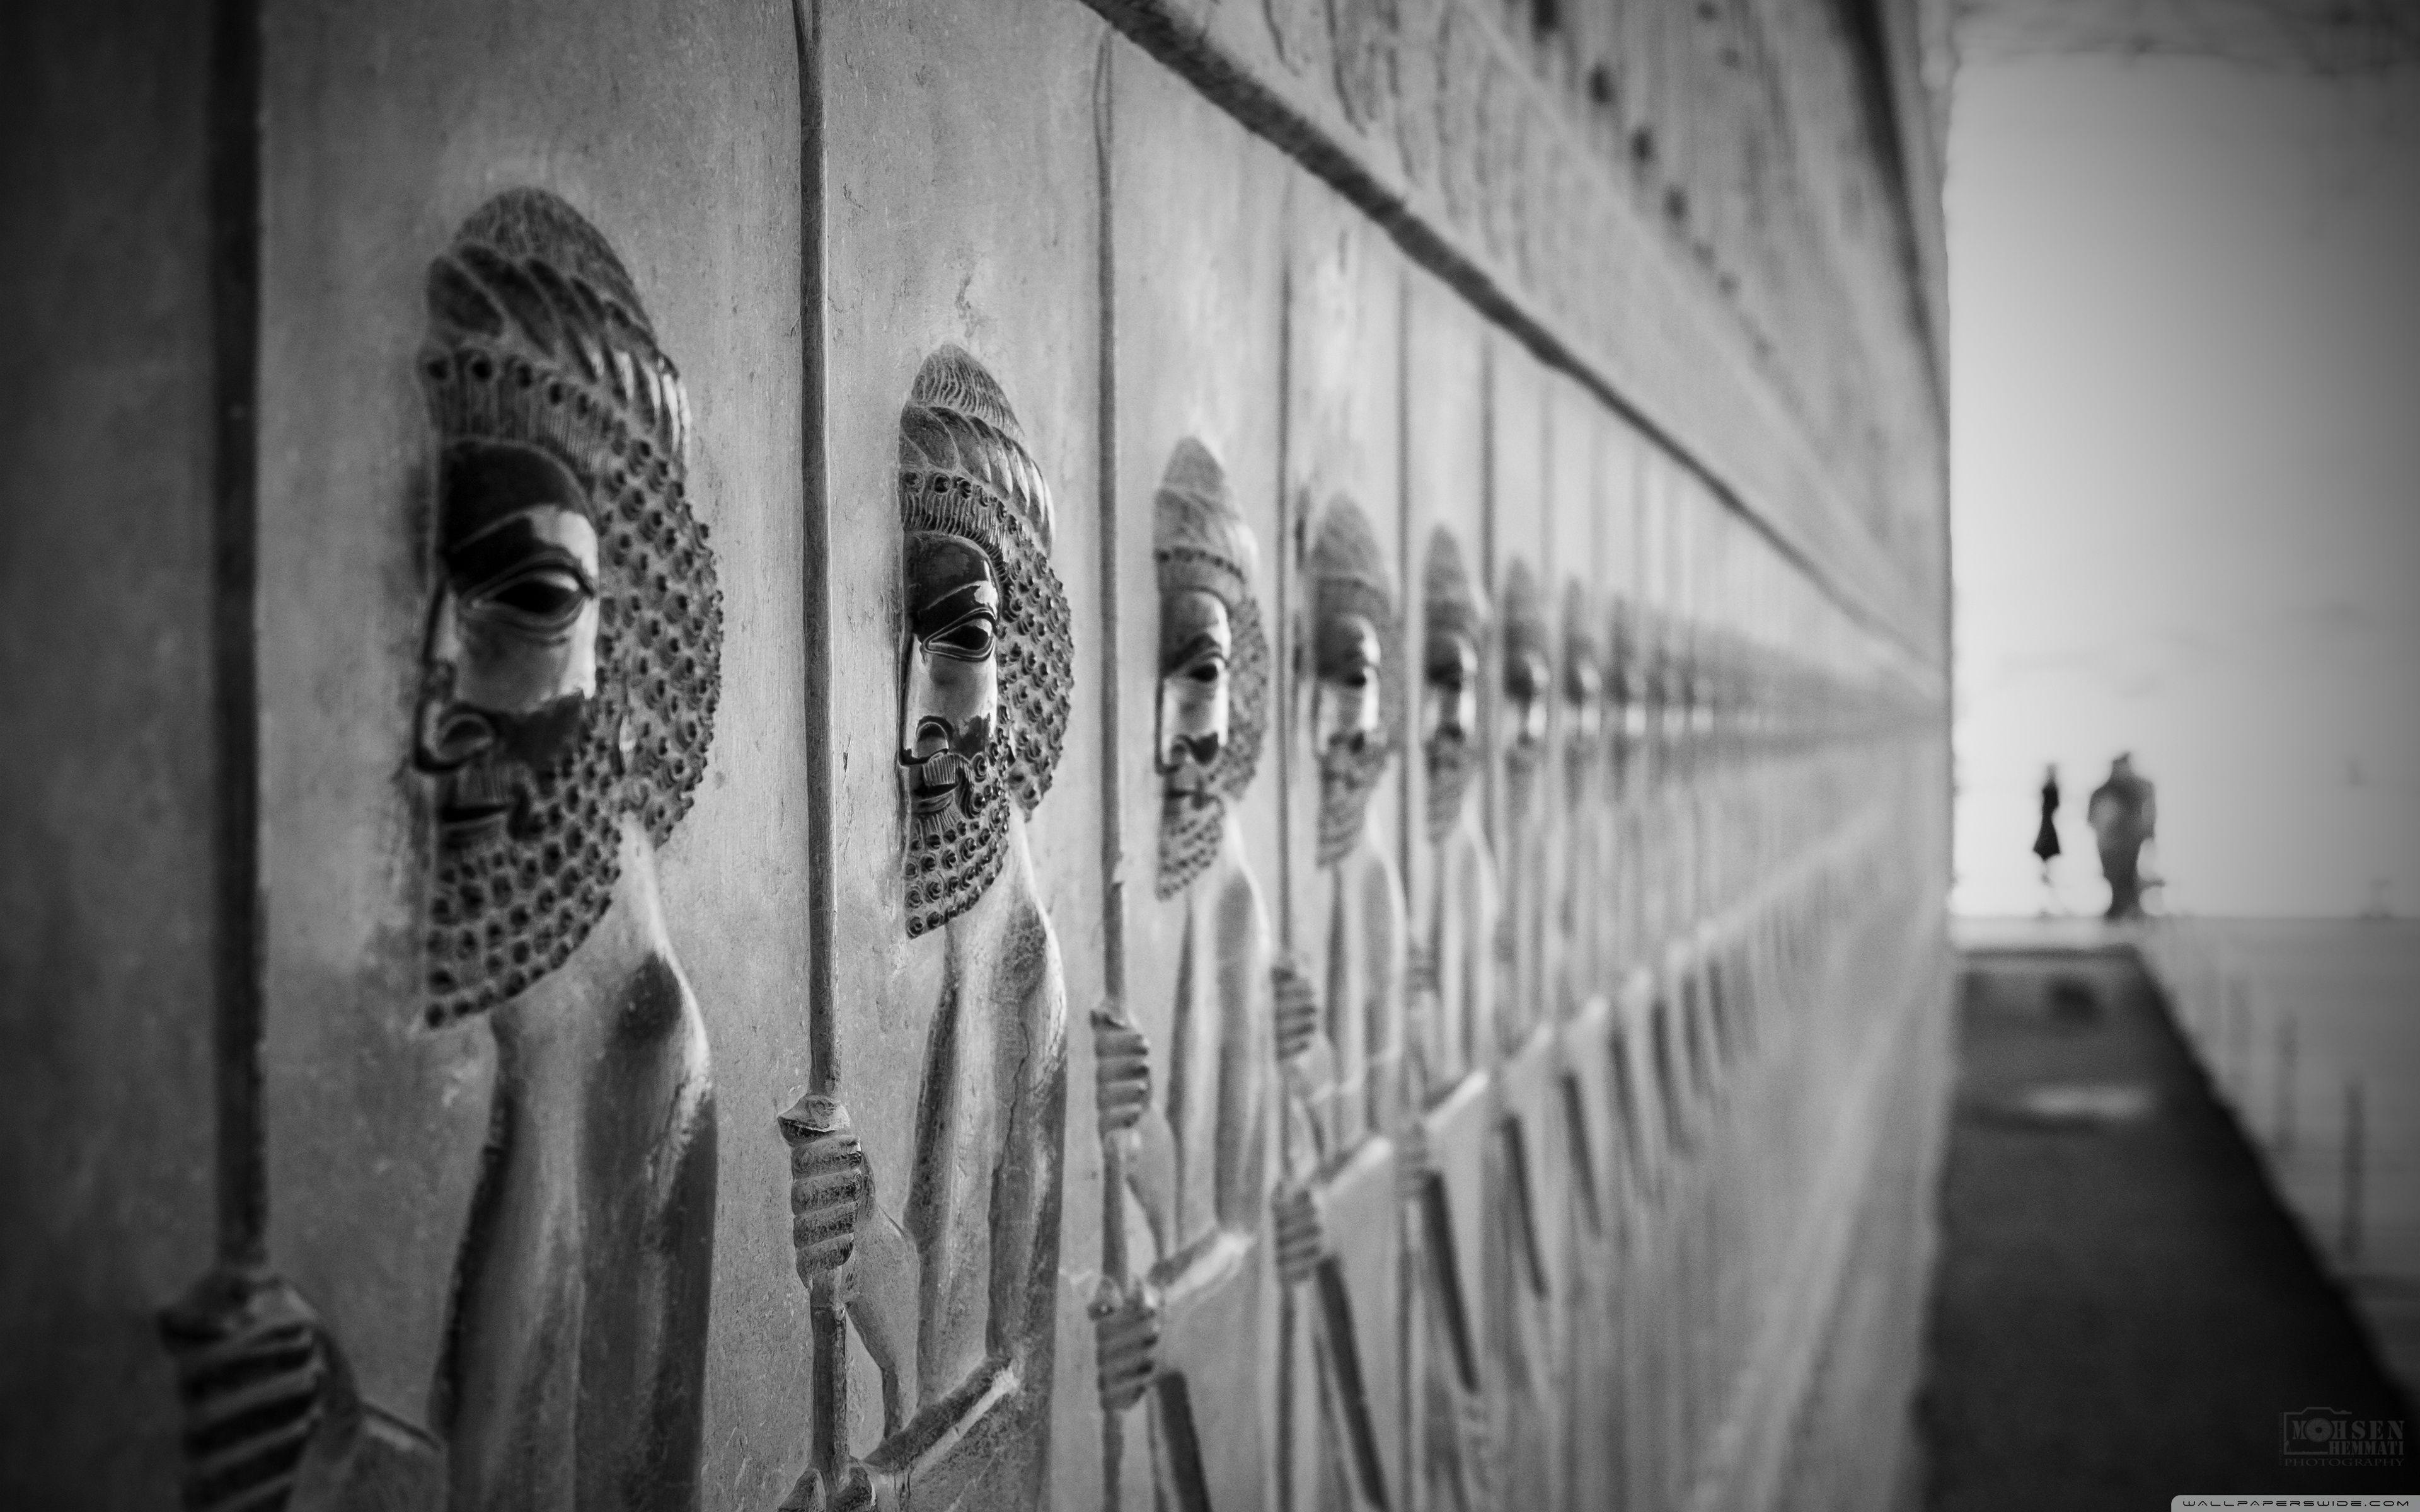 Persepolis Wallpapers Top Free Persepolis Backgrounds Wallpaperaccess